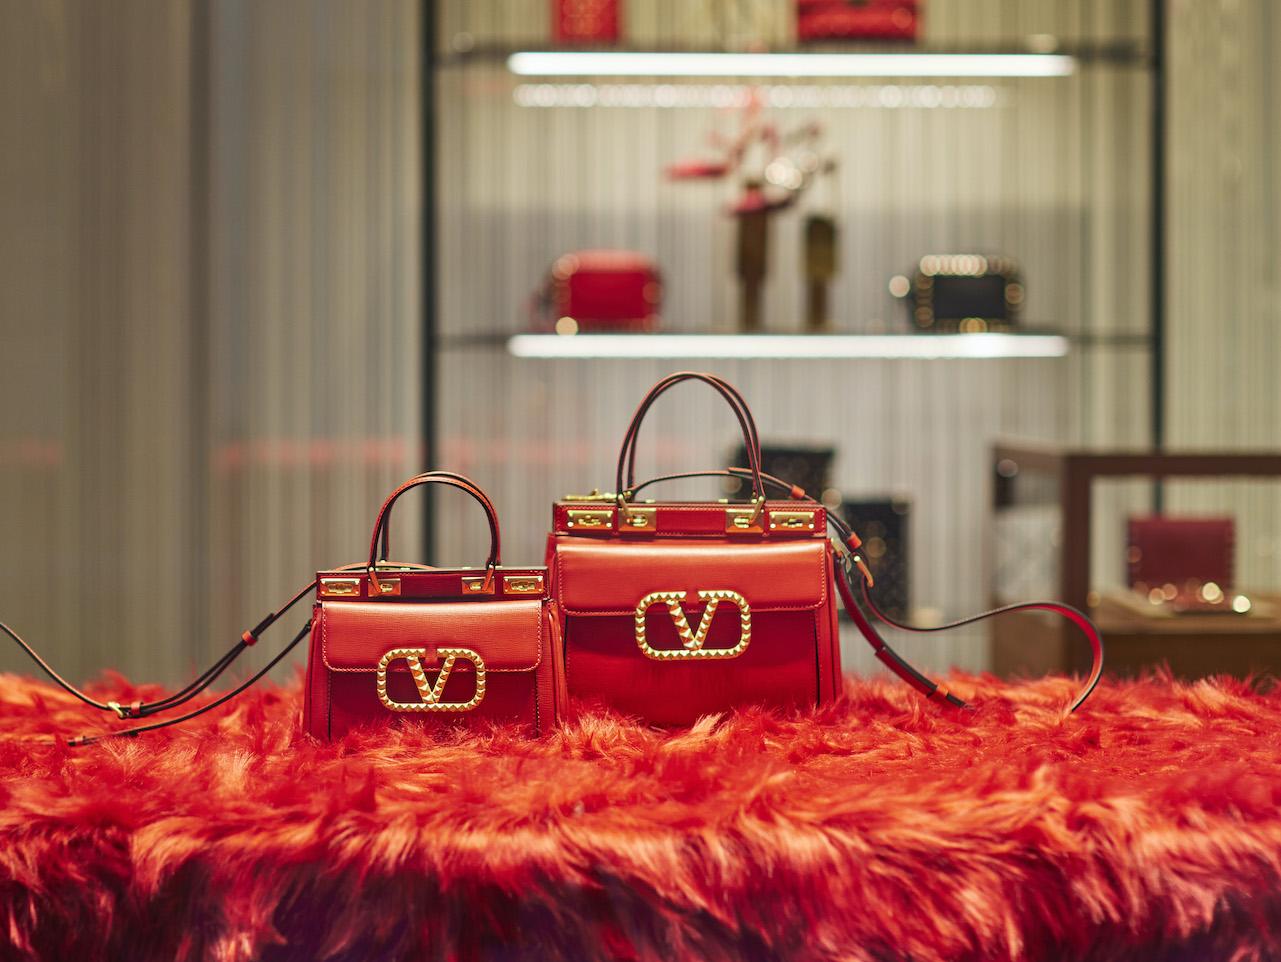 Maison Valentino - Betony Vernon - Ph Courtesy Valentino